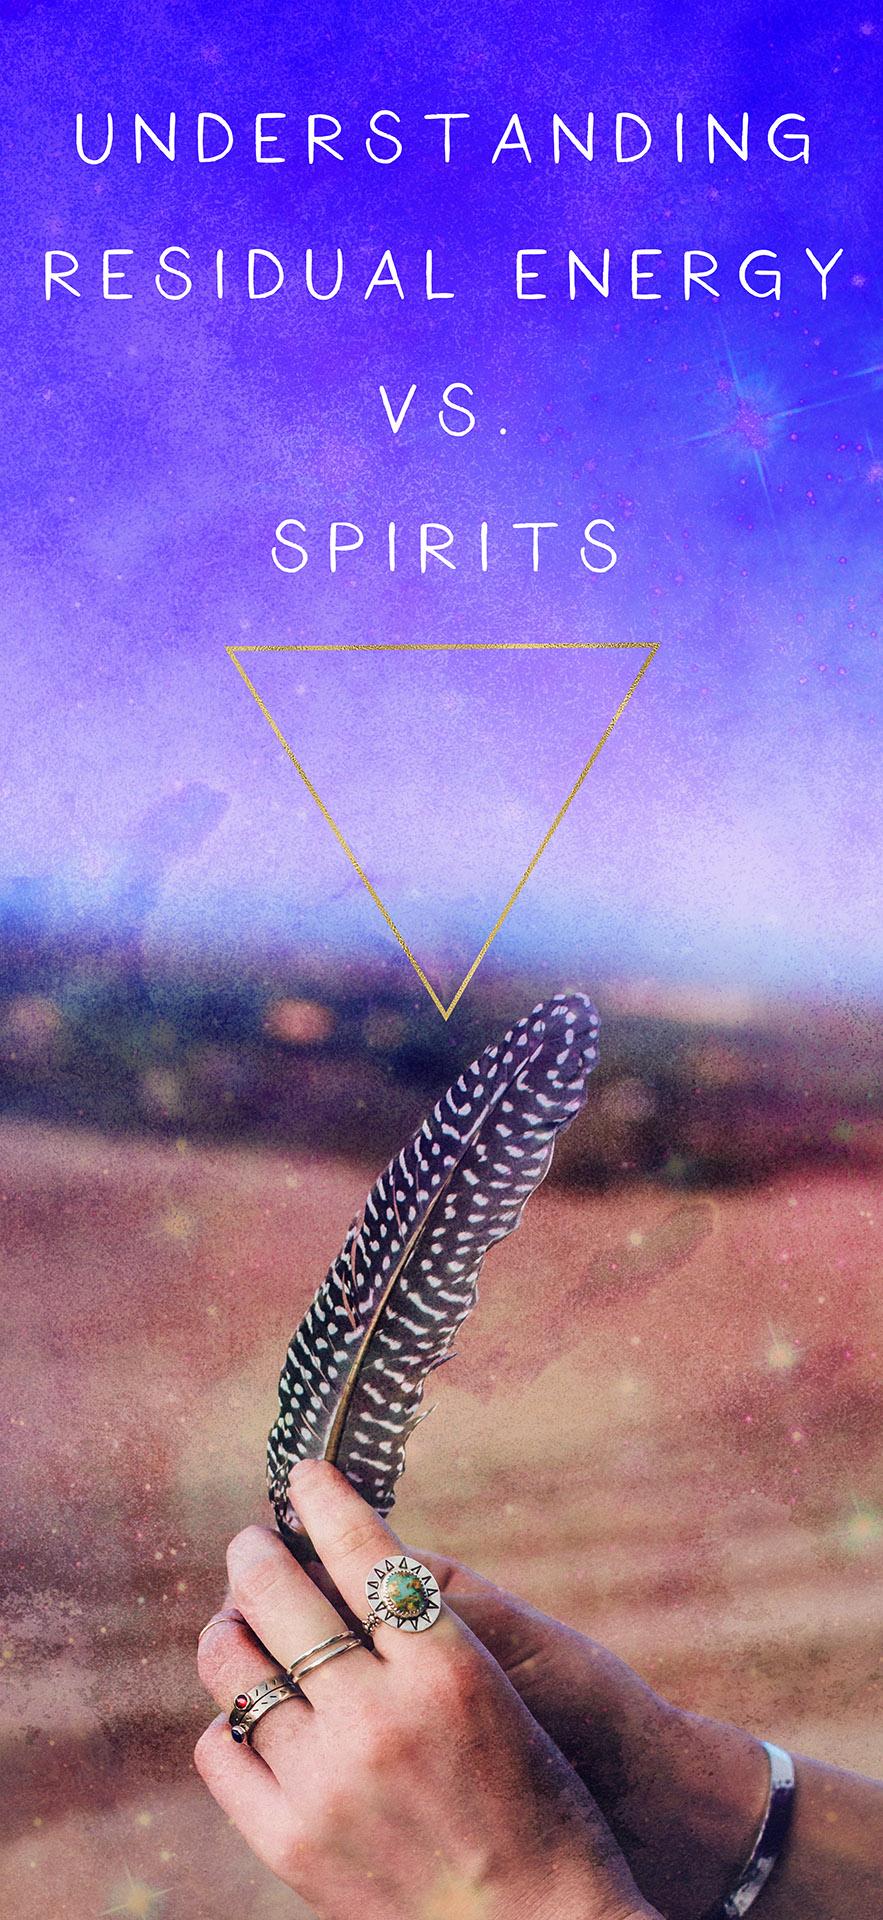 understanding residual energy vs spirits